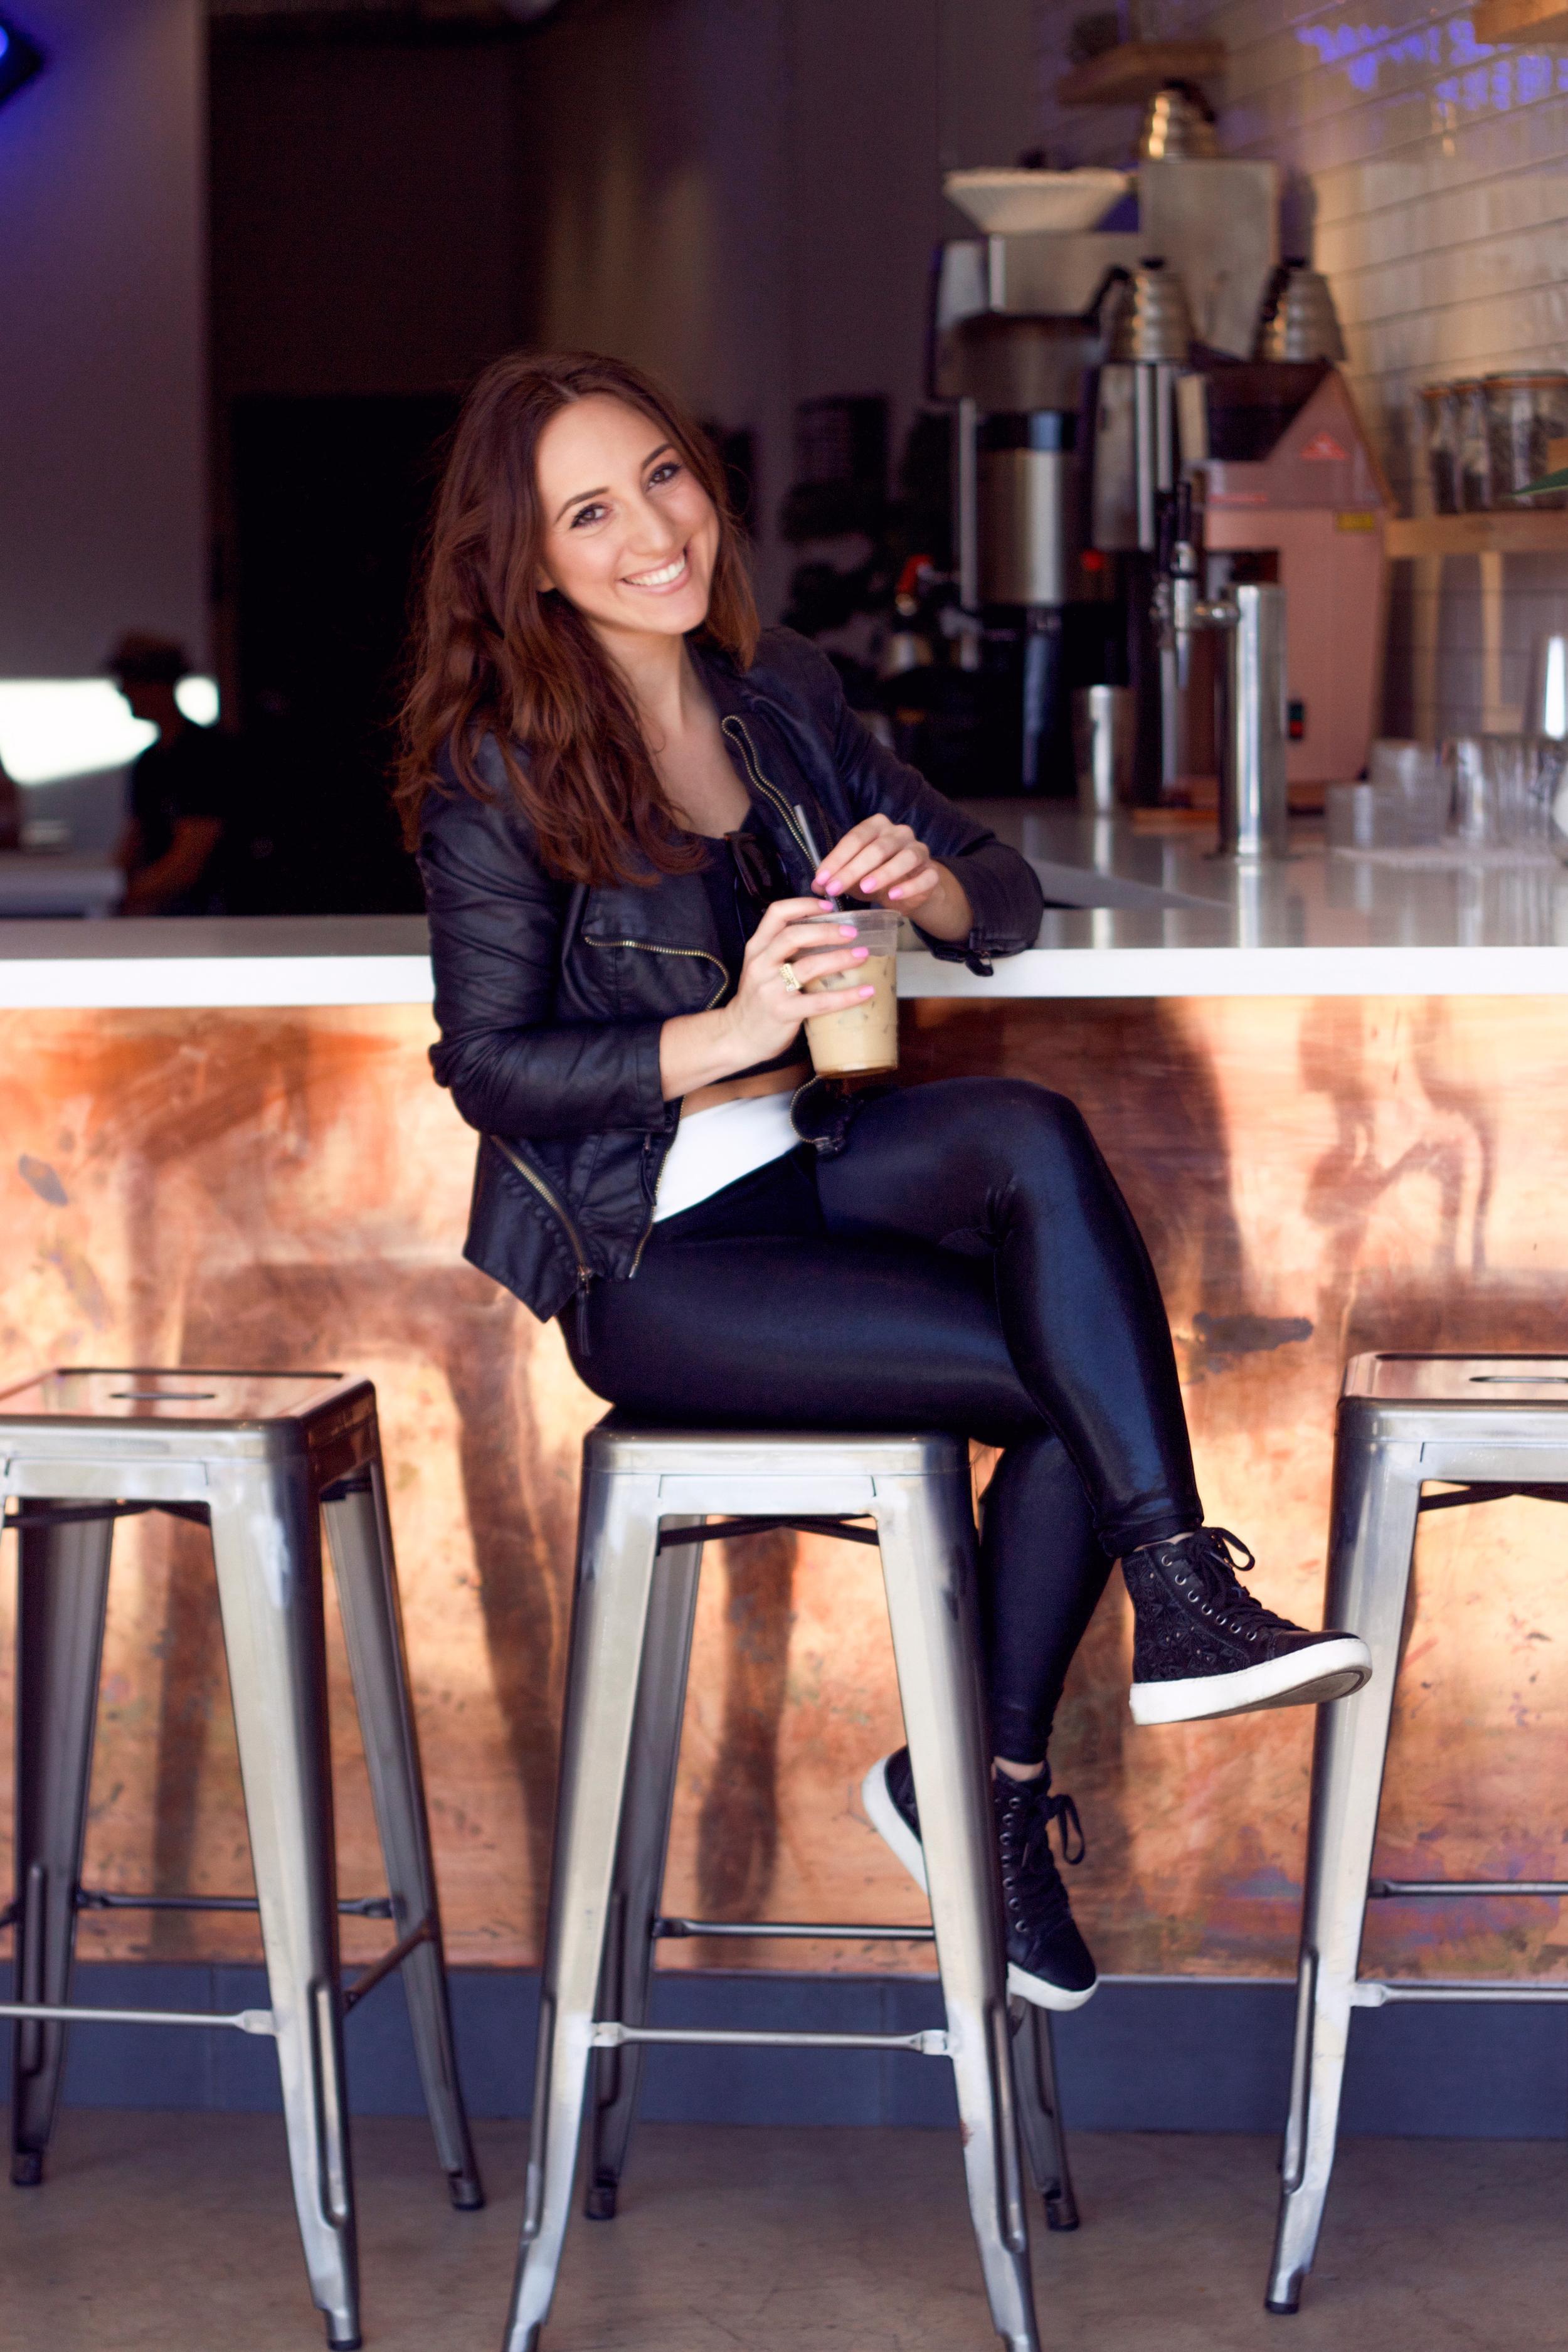 Brielle Galekovic in SukiShufu Leatherback Leggings on The Gilded Bellini - thegildedbellini.com